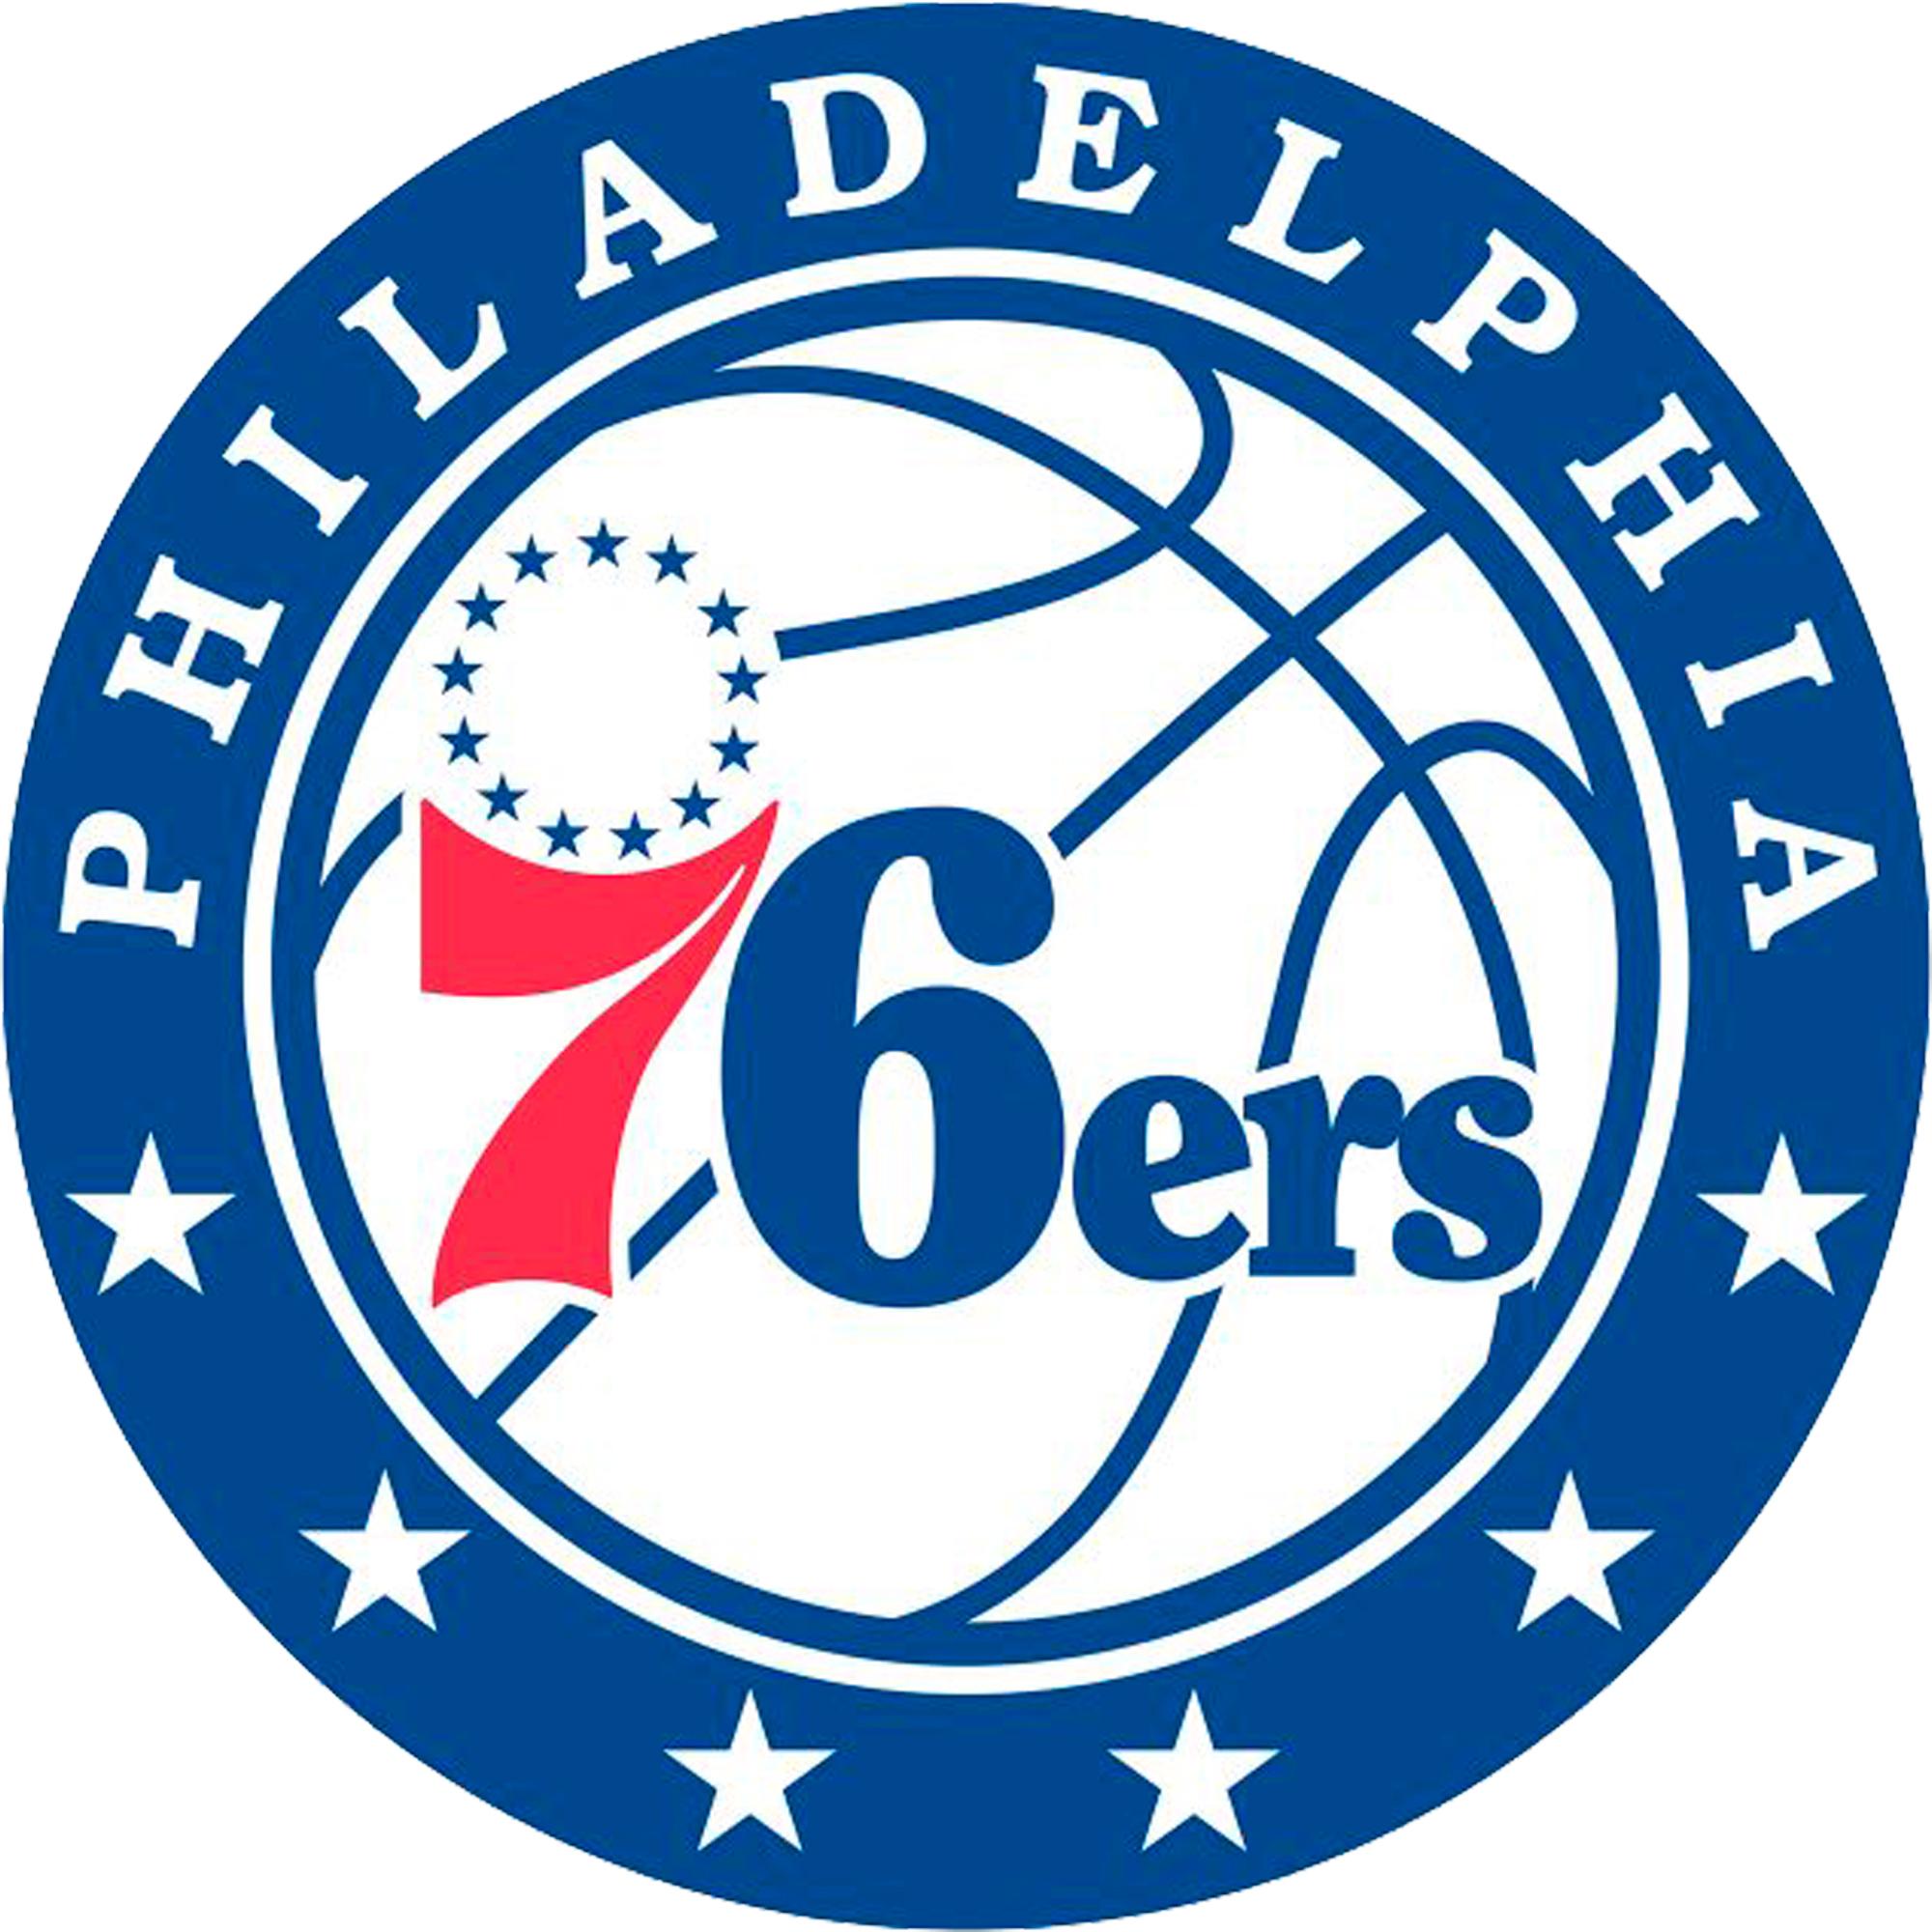 Philadelphia 76ers Fathead Giant Removable Decal - No Size